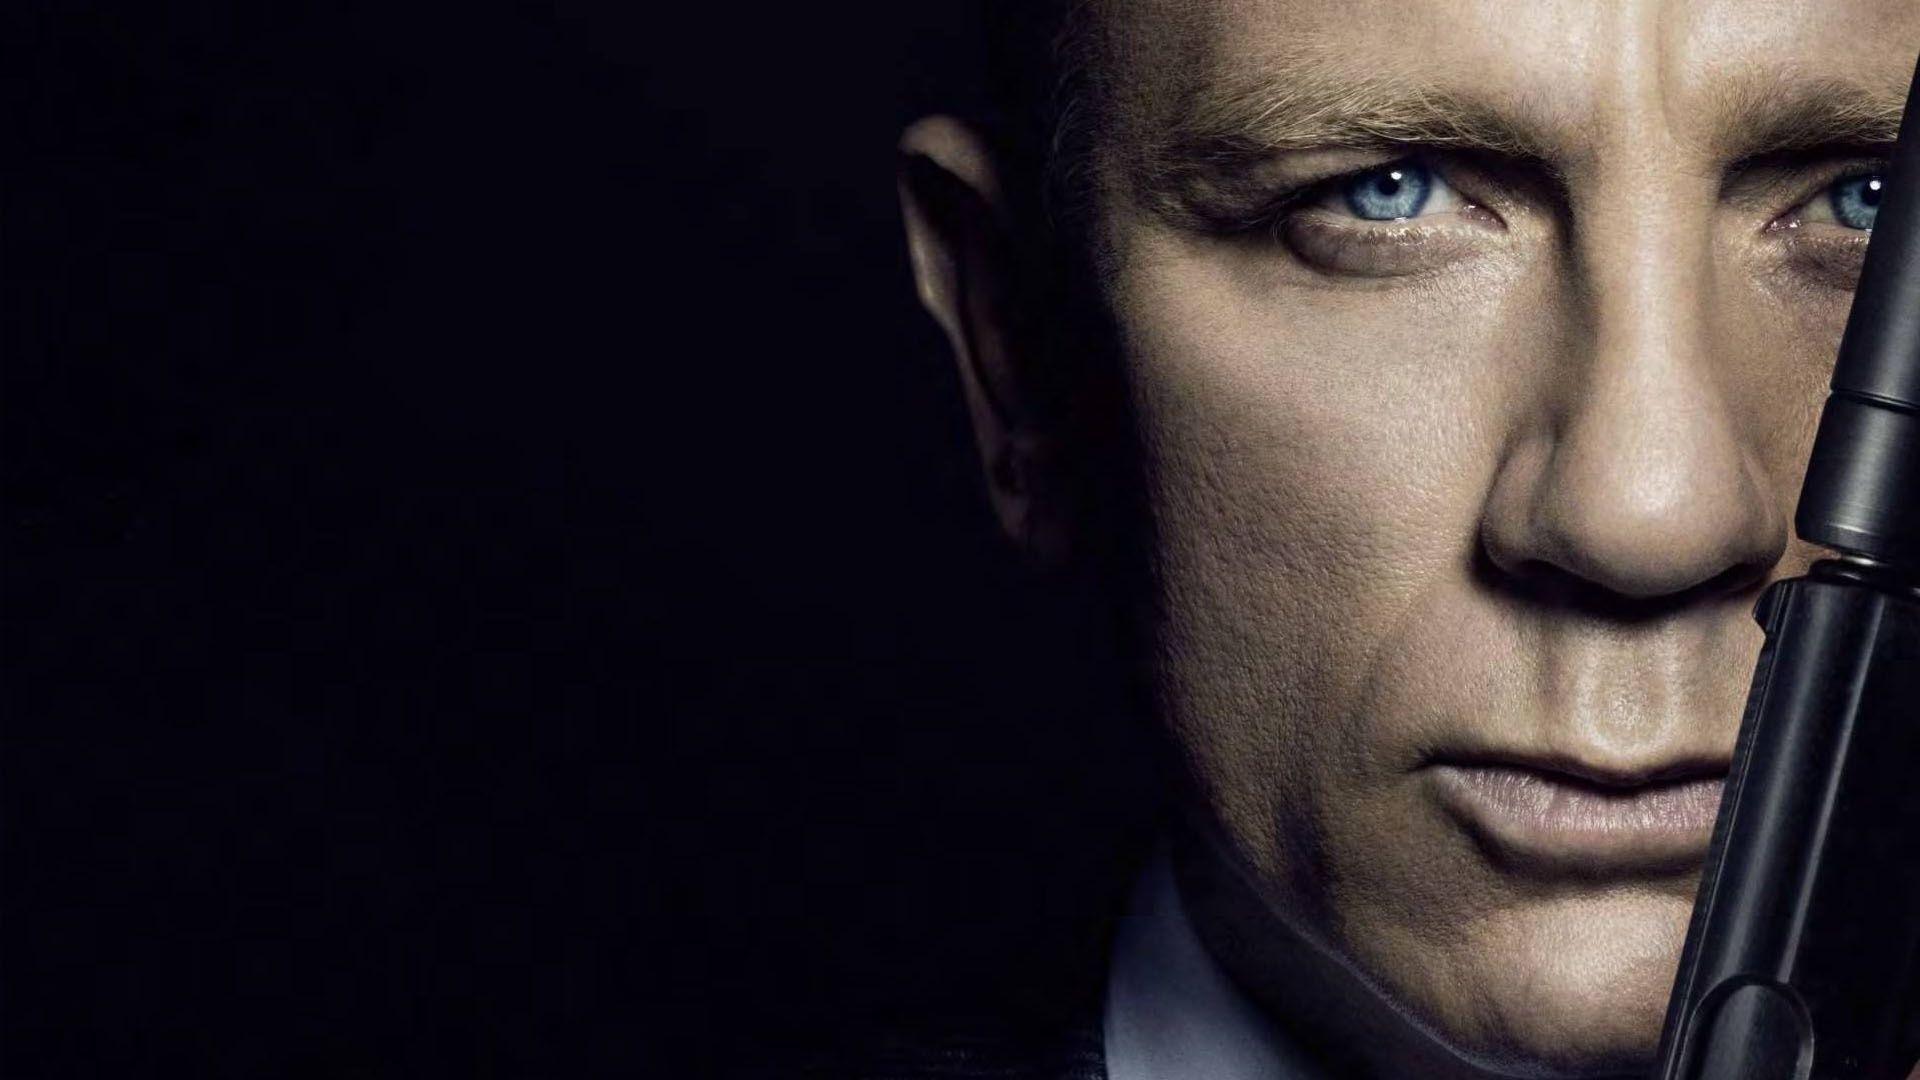 Jb 007 Daniel Craig James Bond Daniel Craig James Bond